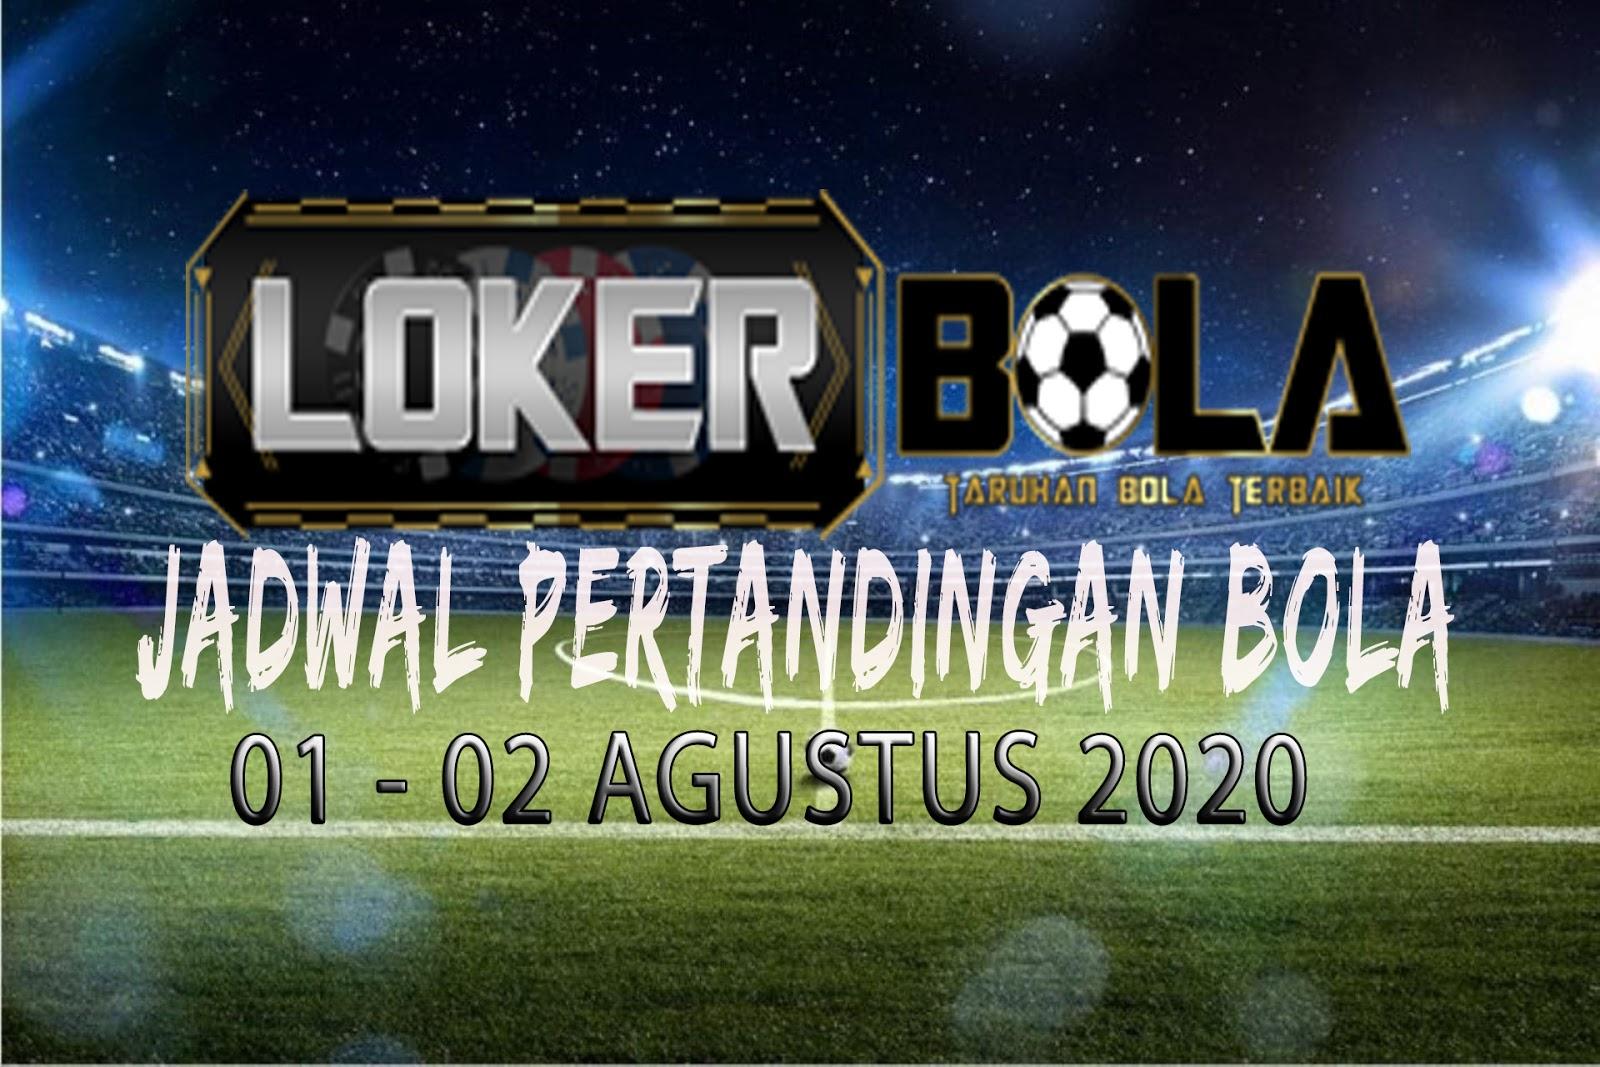 JADWAL PERTANDINGAN BOLA 01 – 02 AGUSTUS 2020